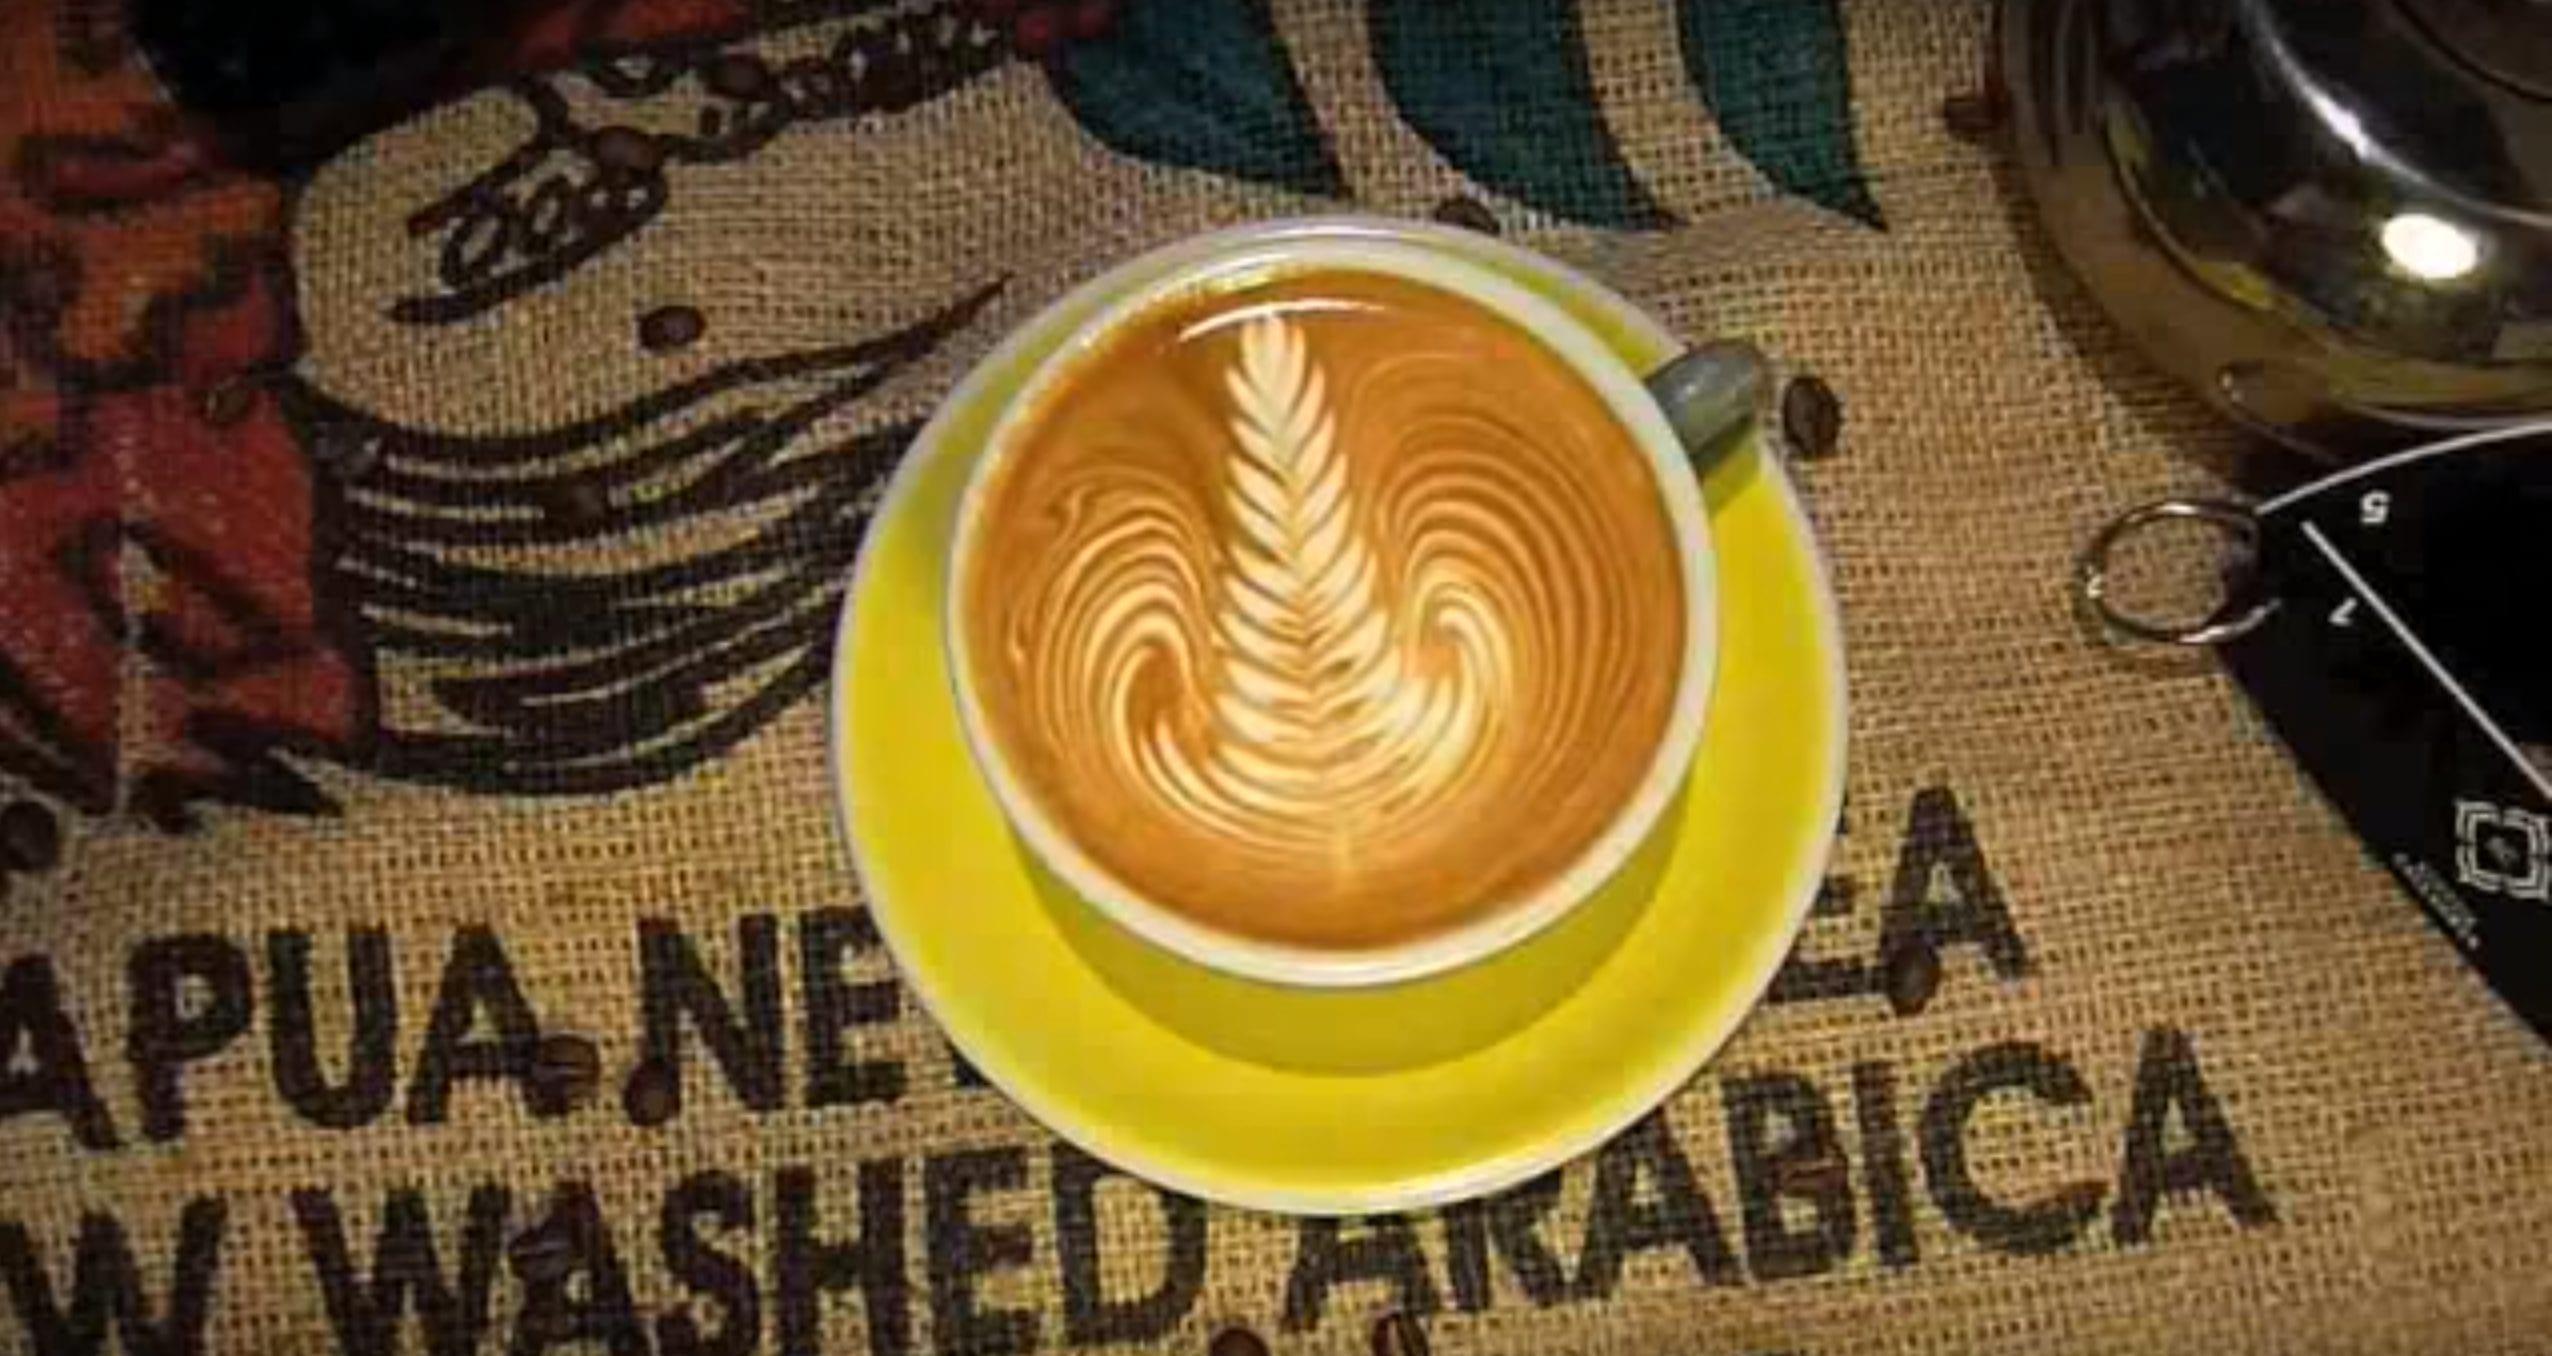 how to pour latte art rosetta